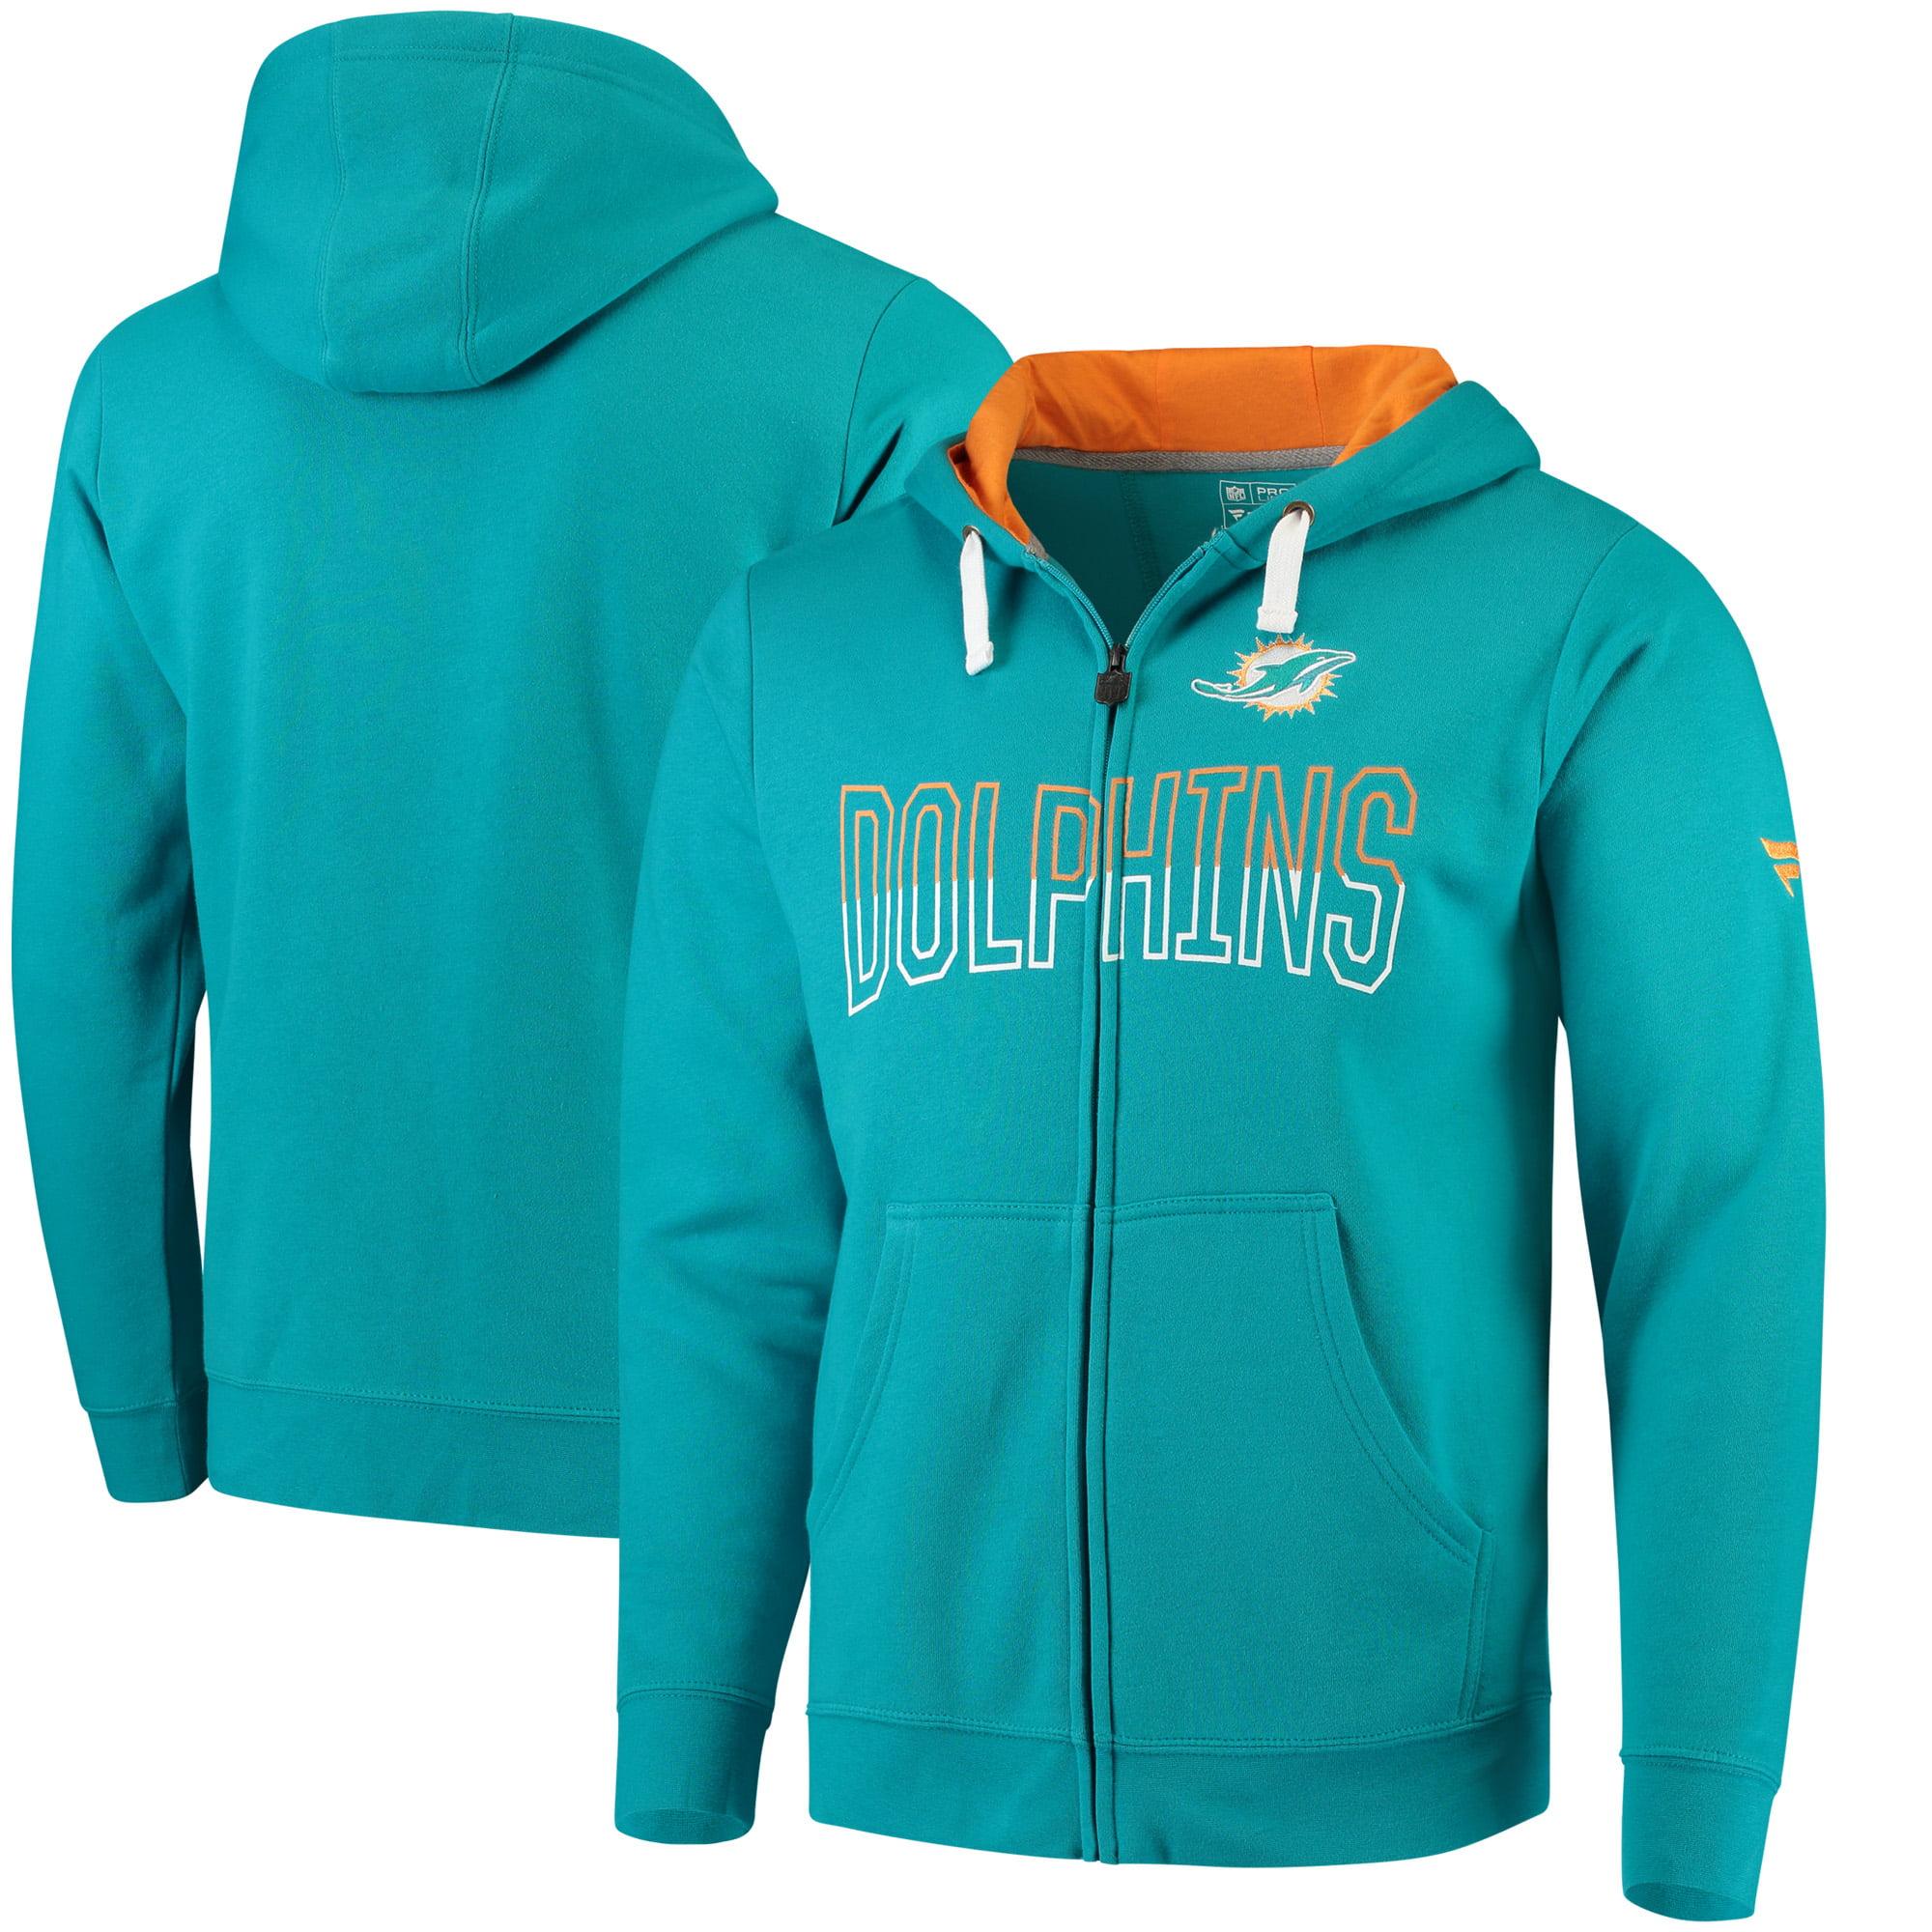 Miami Dolphins NFL Pro Line by Fanatics Branded Iconic Fleece Full-Zip Hoodie - Aqua - L